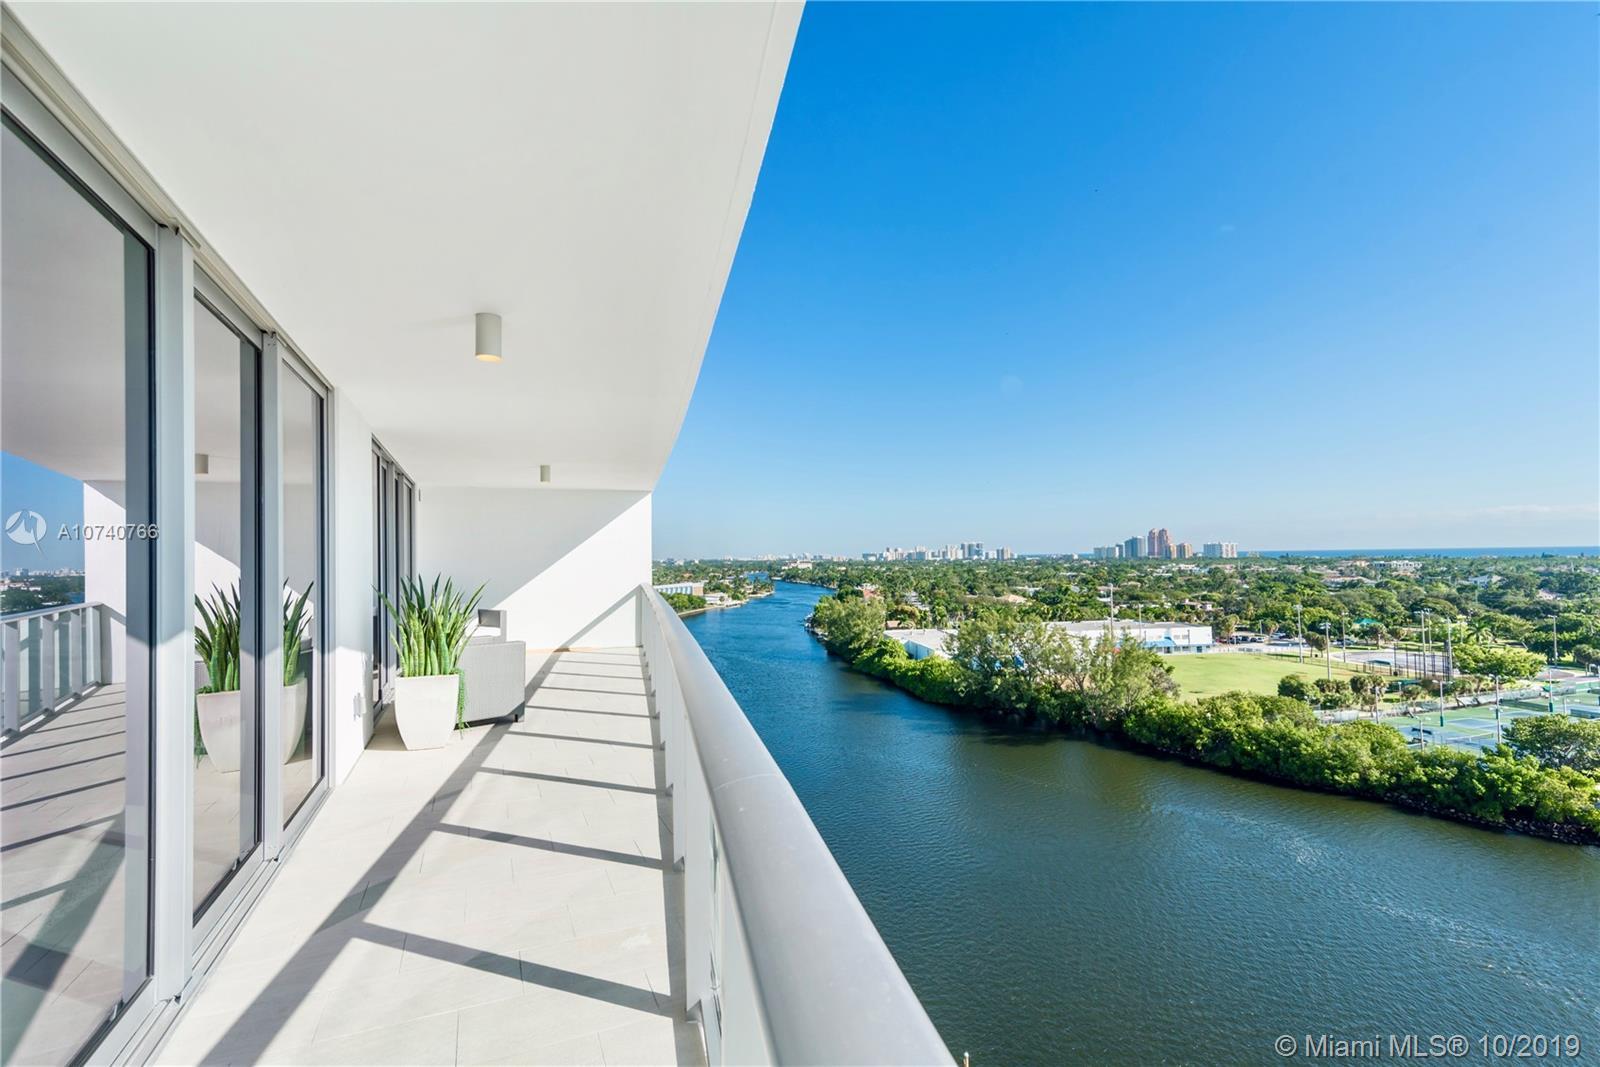 Riva Fort Lauderdale #1210 - 01 - photo